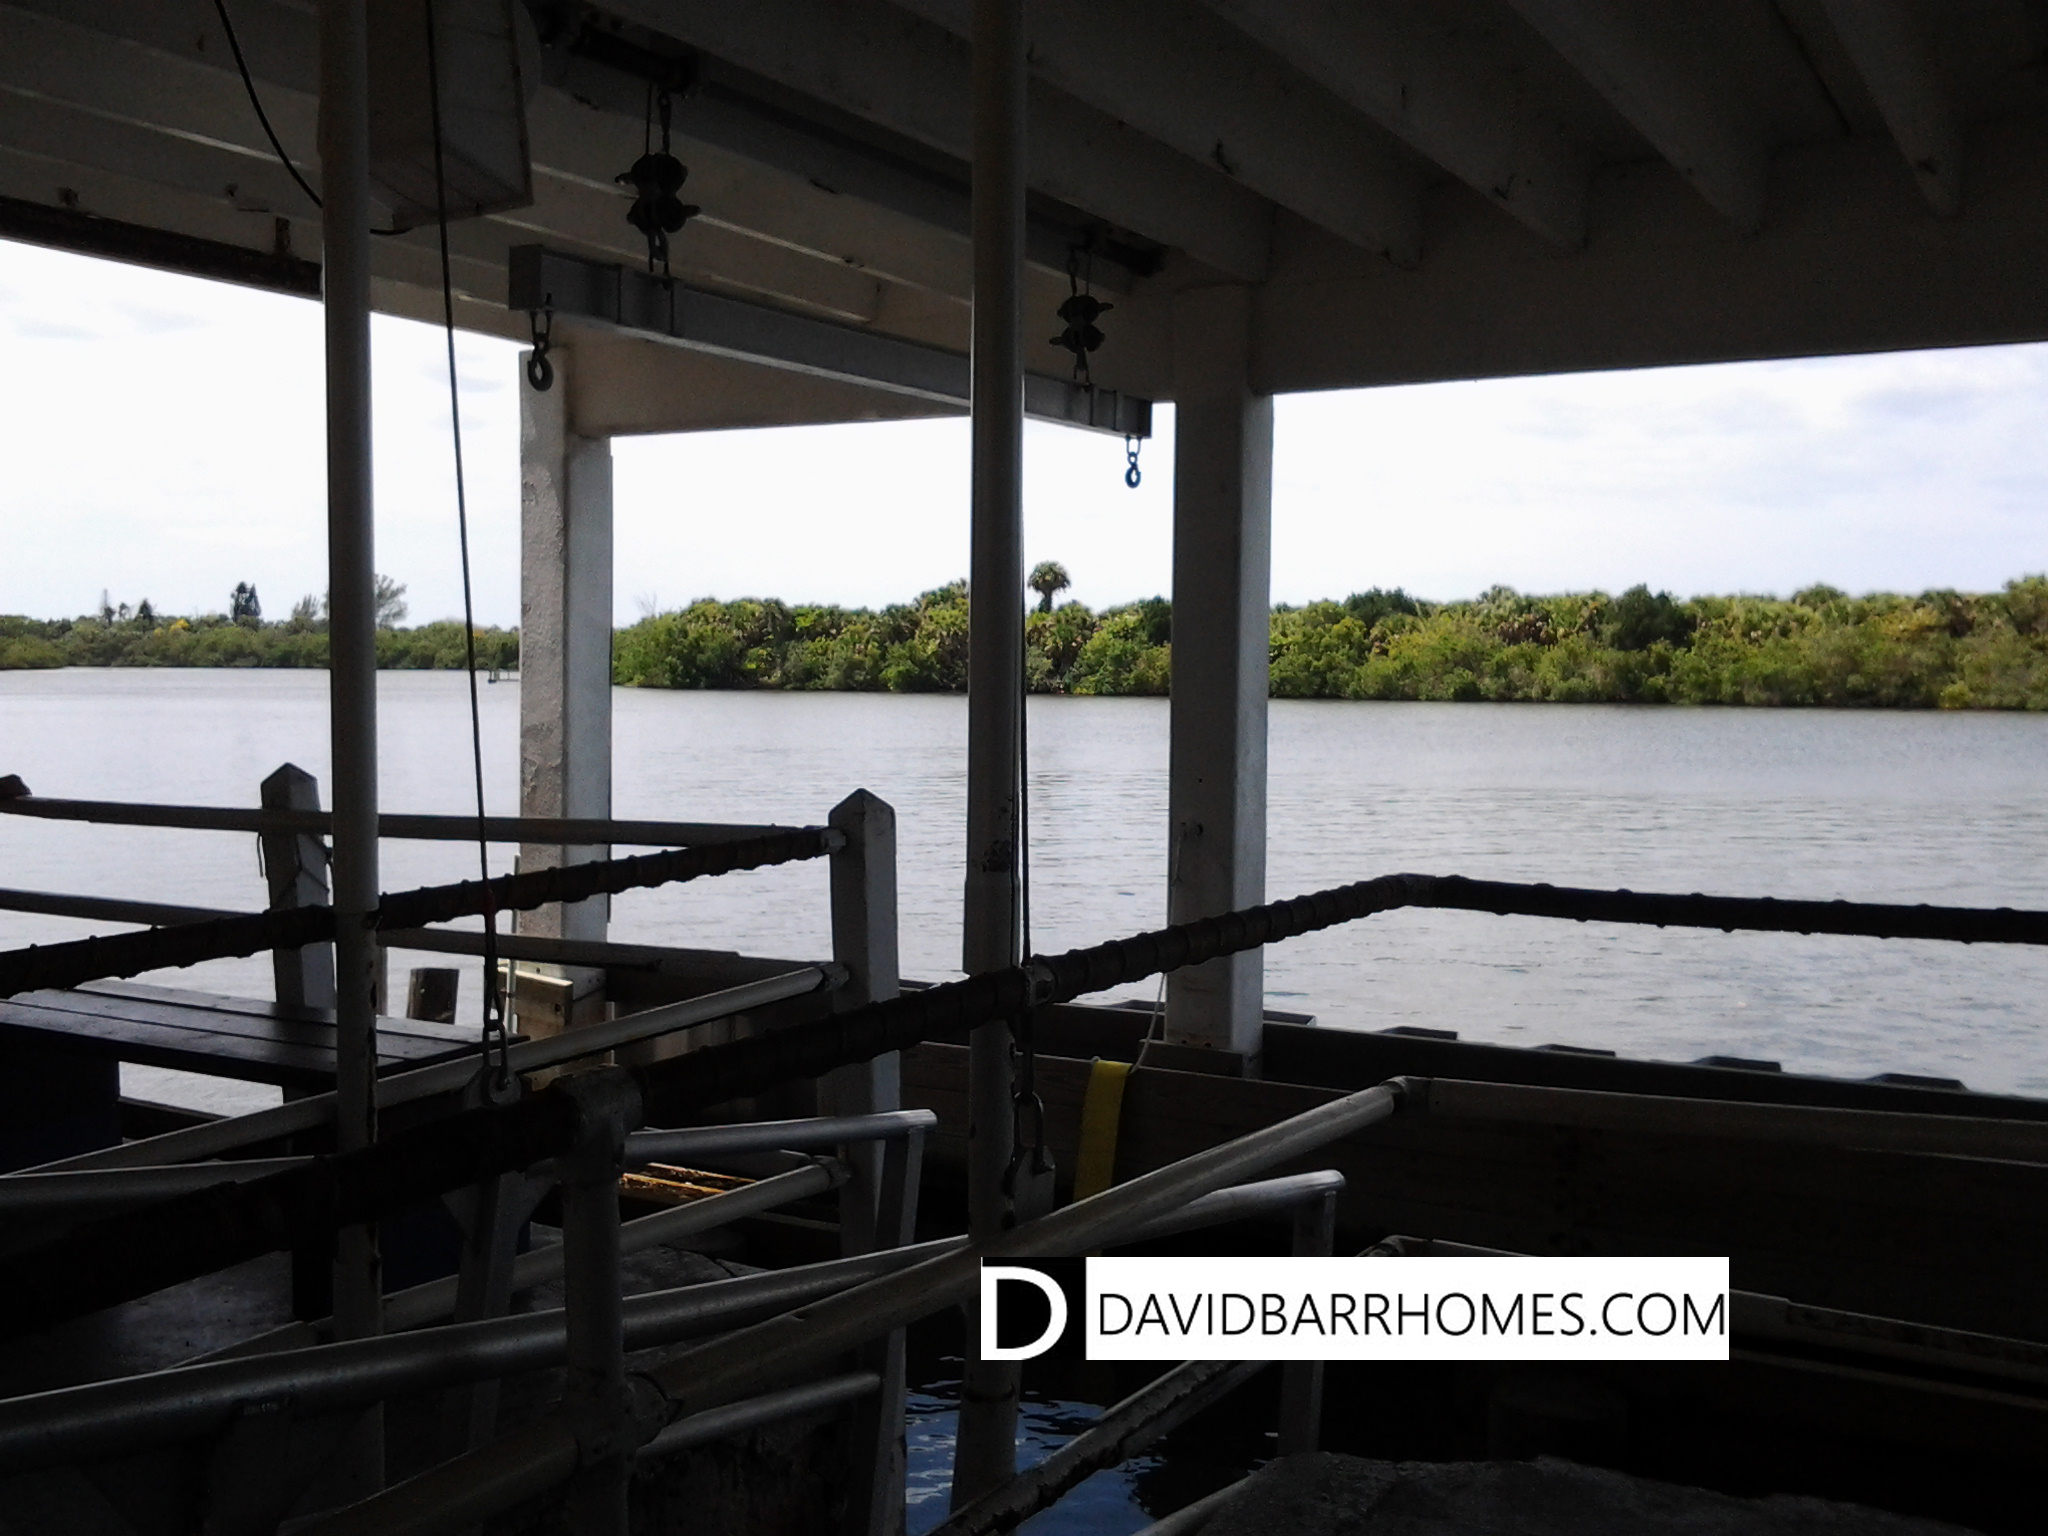 South Venice beach ferry view